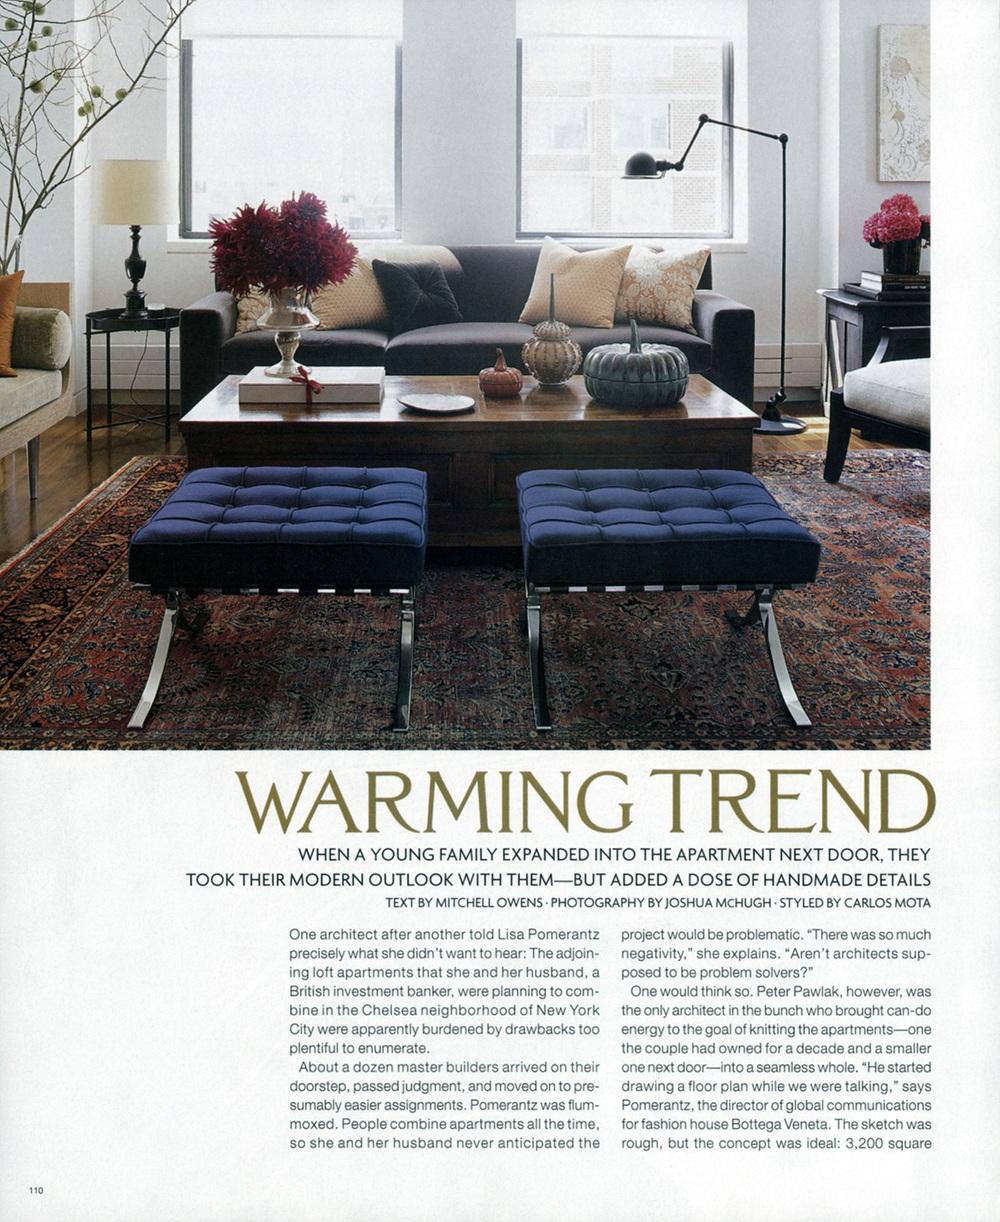 ED warming trends02.jpg